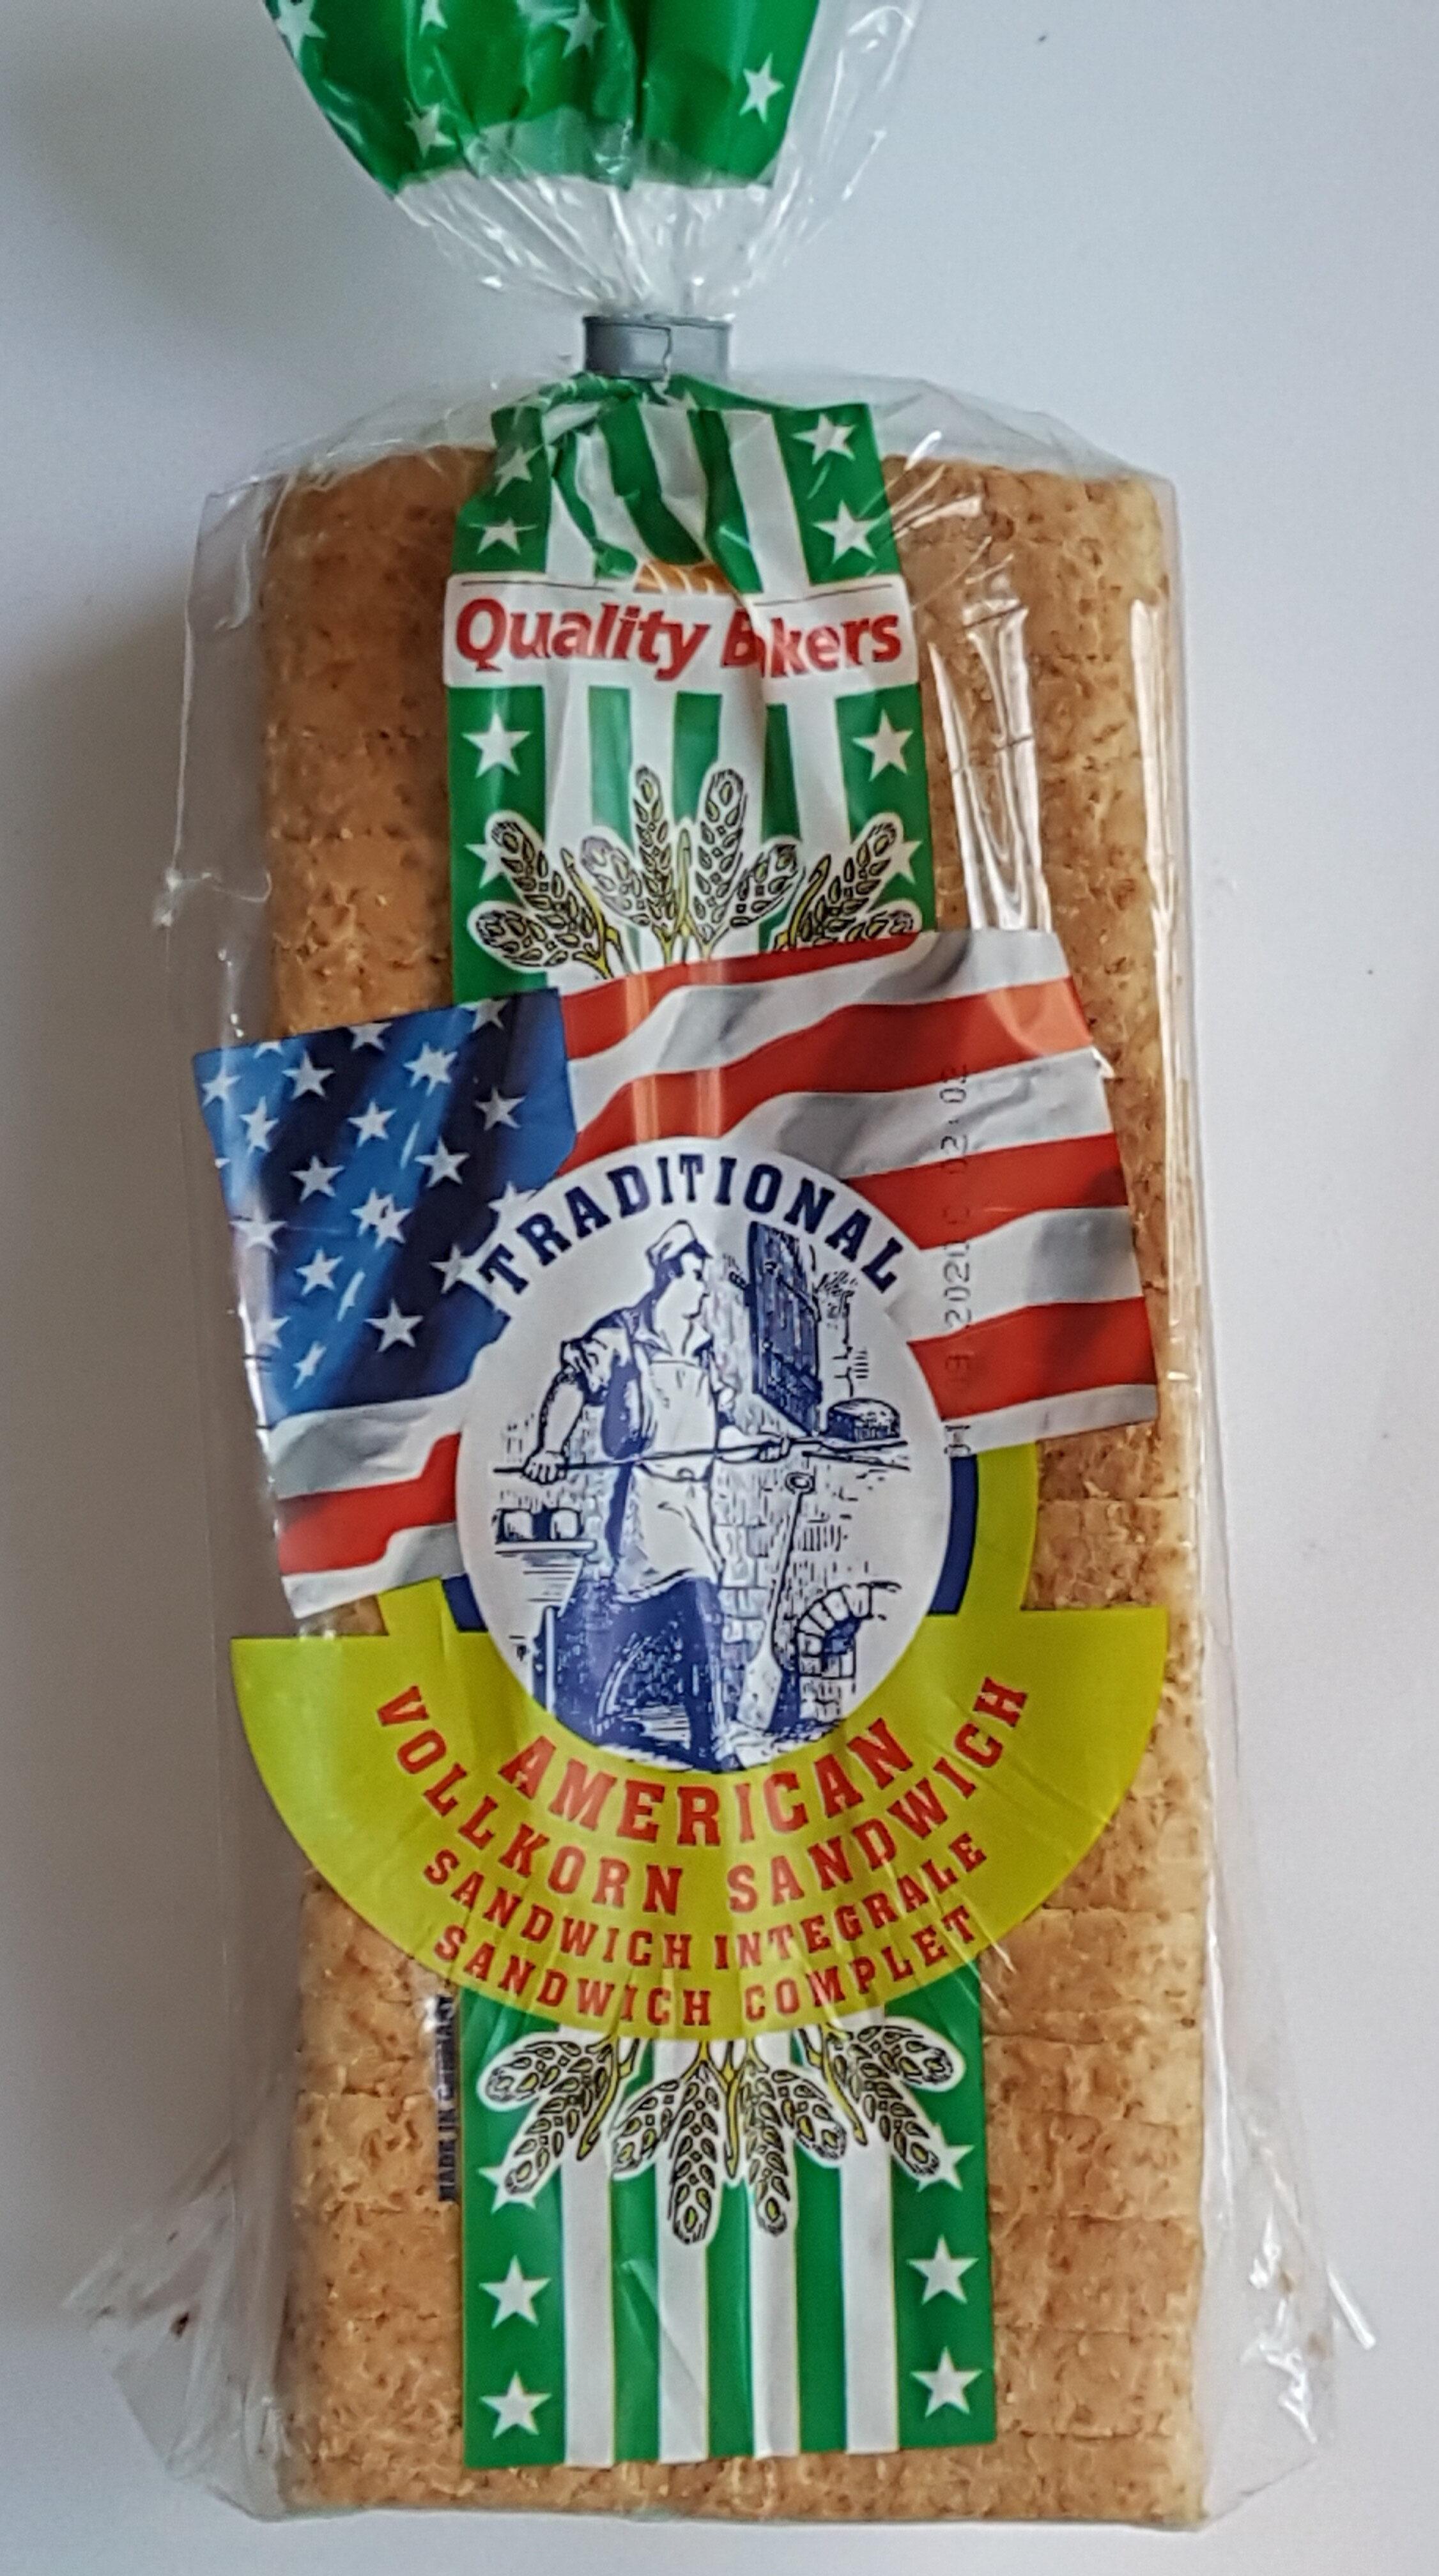 Traditional American Vollkorn Sandwich - Prodotto - fr